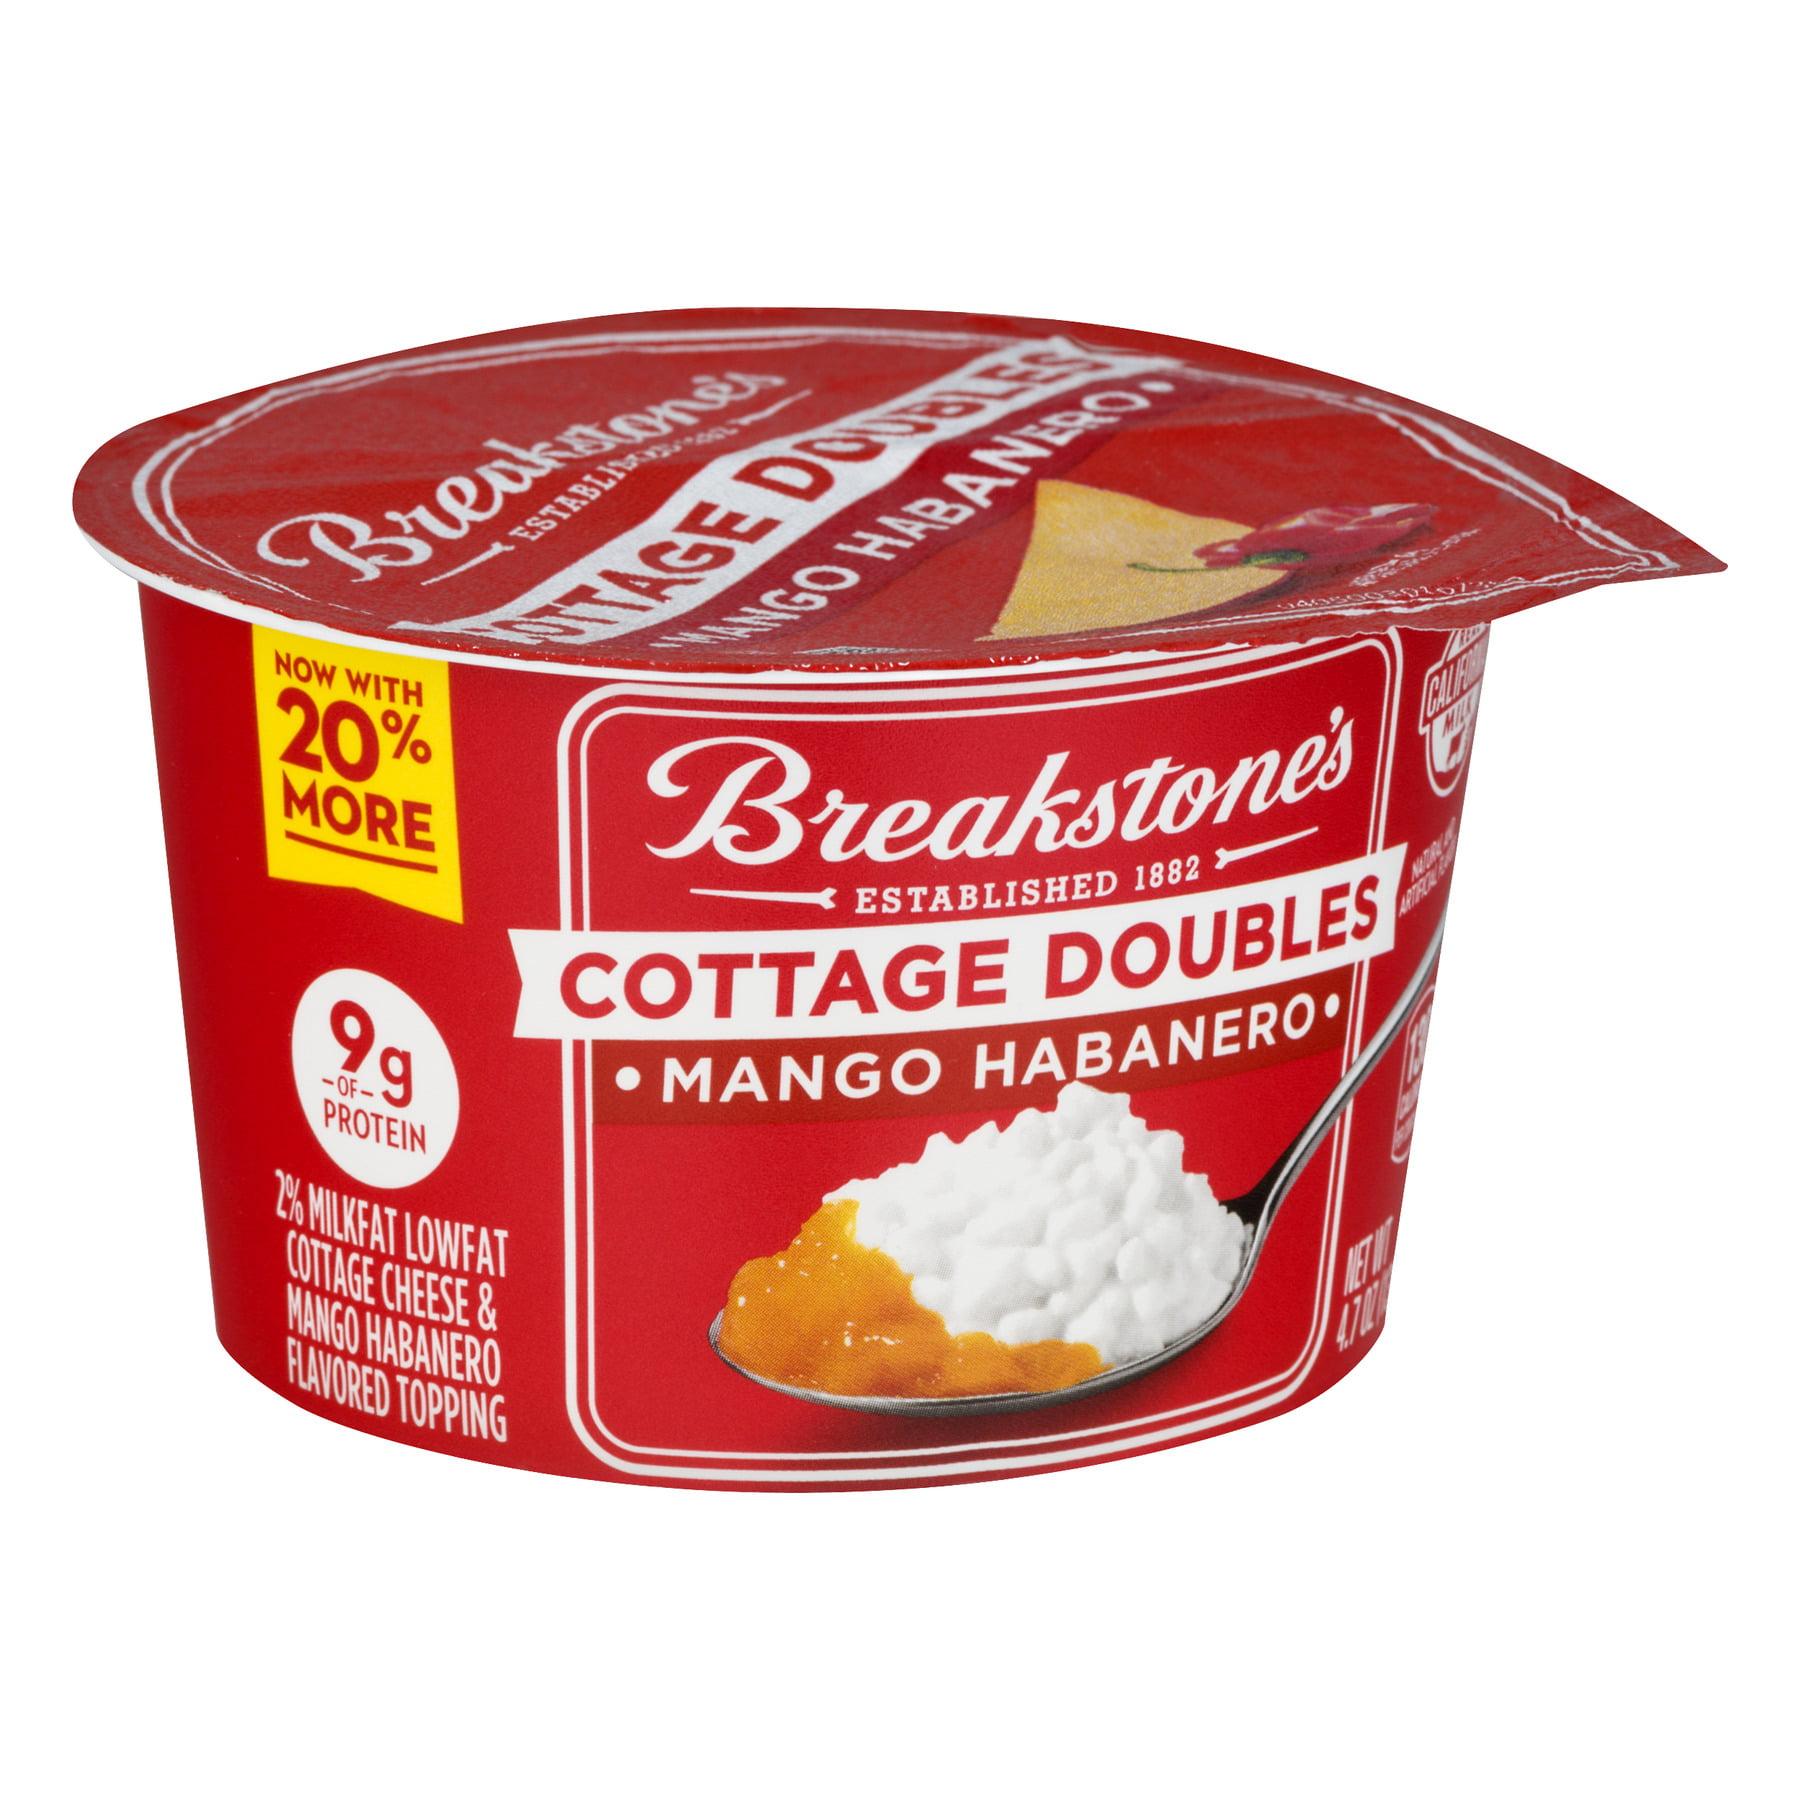 breakstones cottage doubles mango habanero cottage cheese 4 7 oz